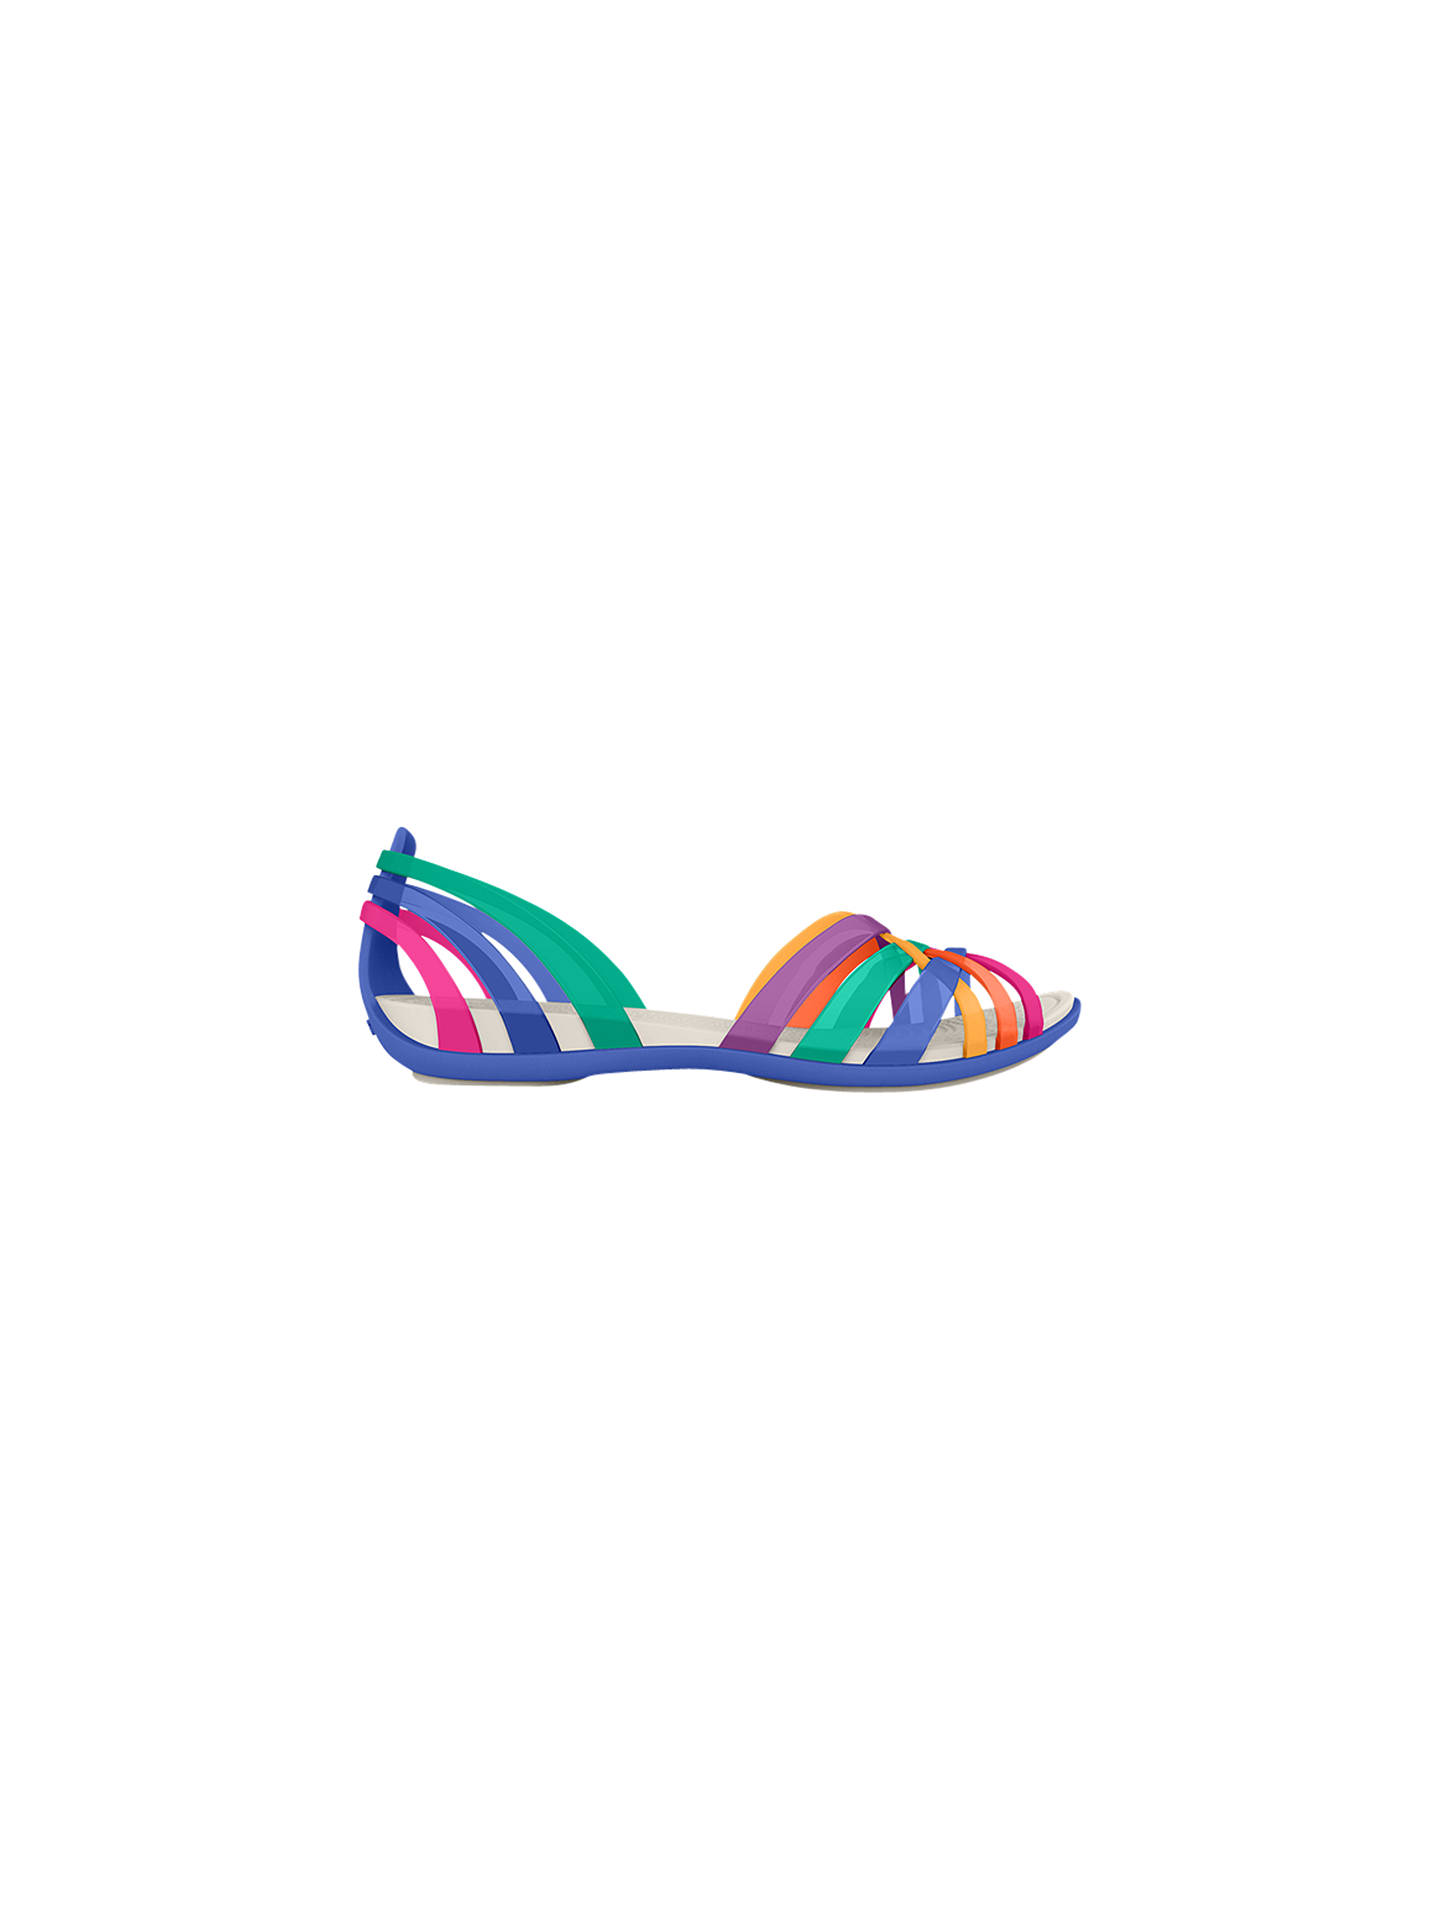 e01cce733033 Buy Crocs Huarache Women s Flat Sandals